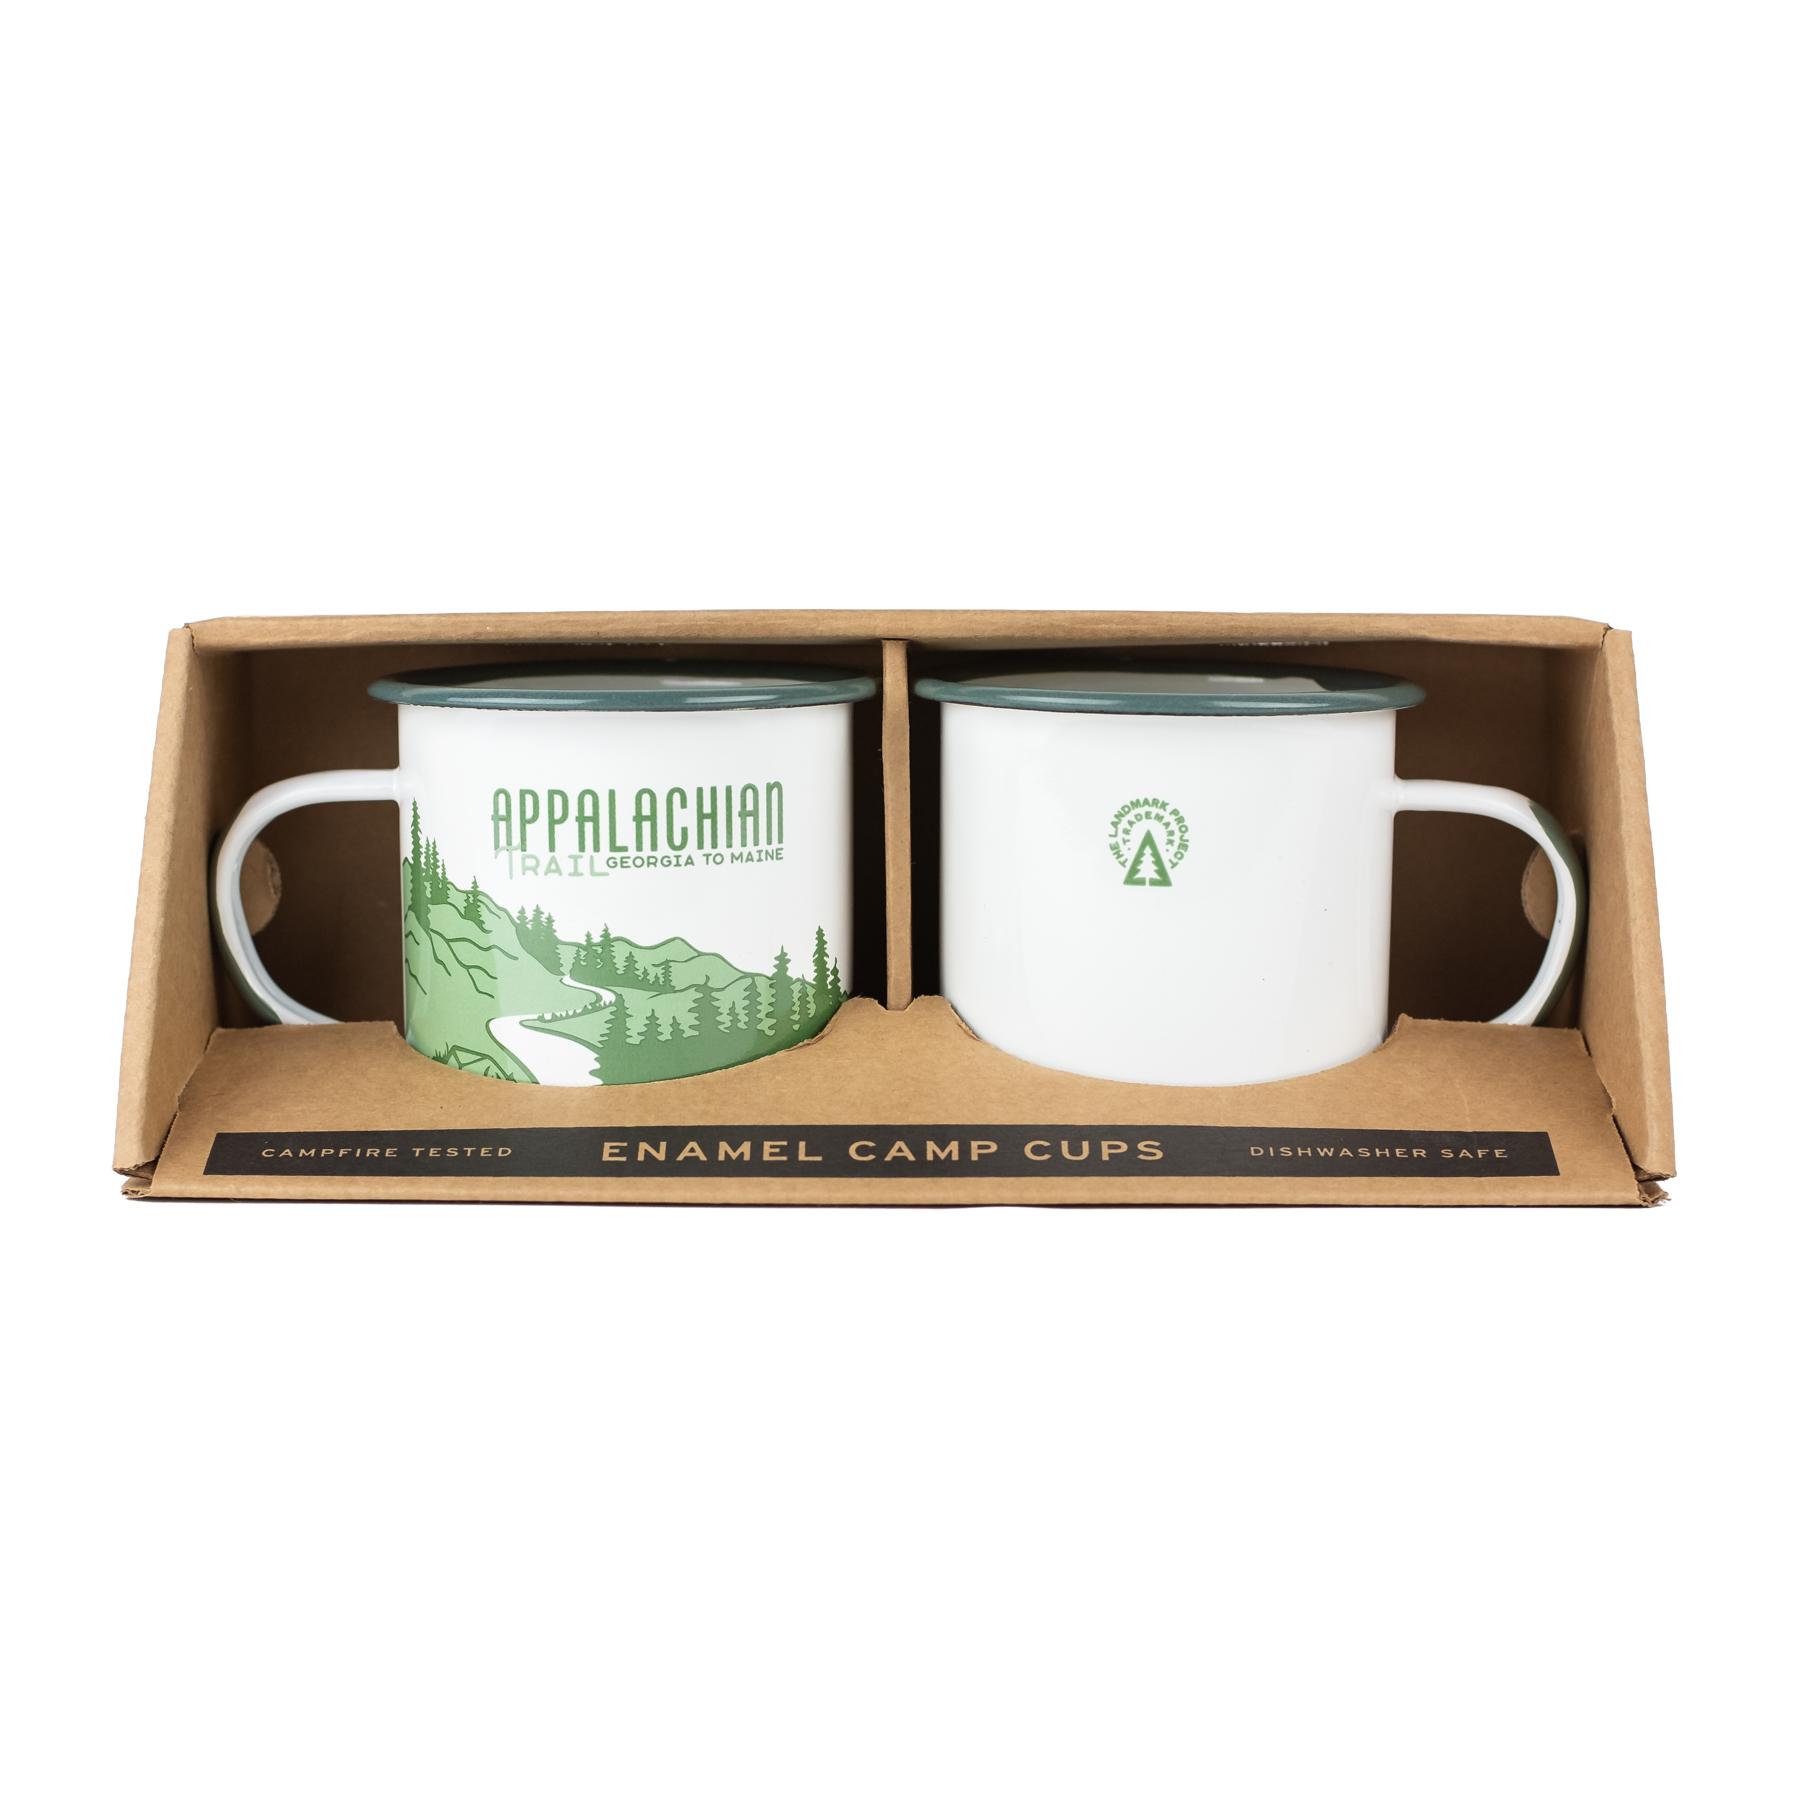 appalachian-trail-mug-5.jpg